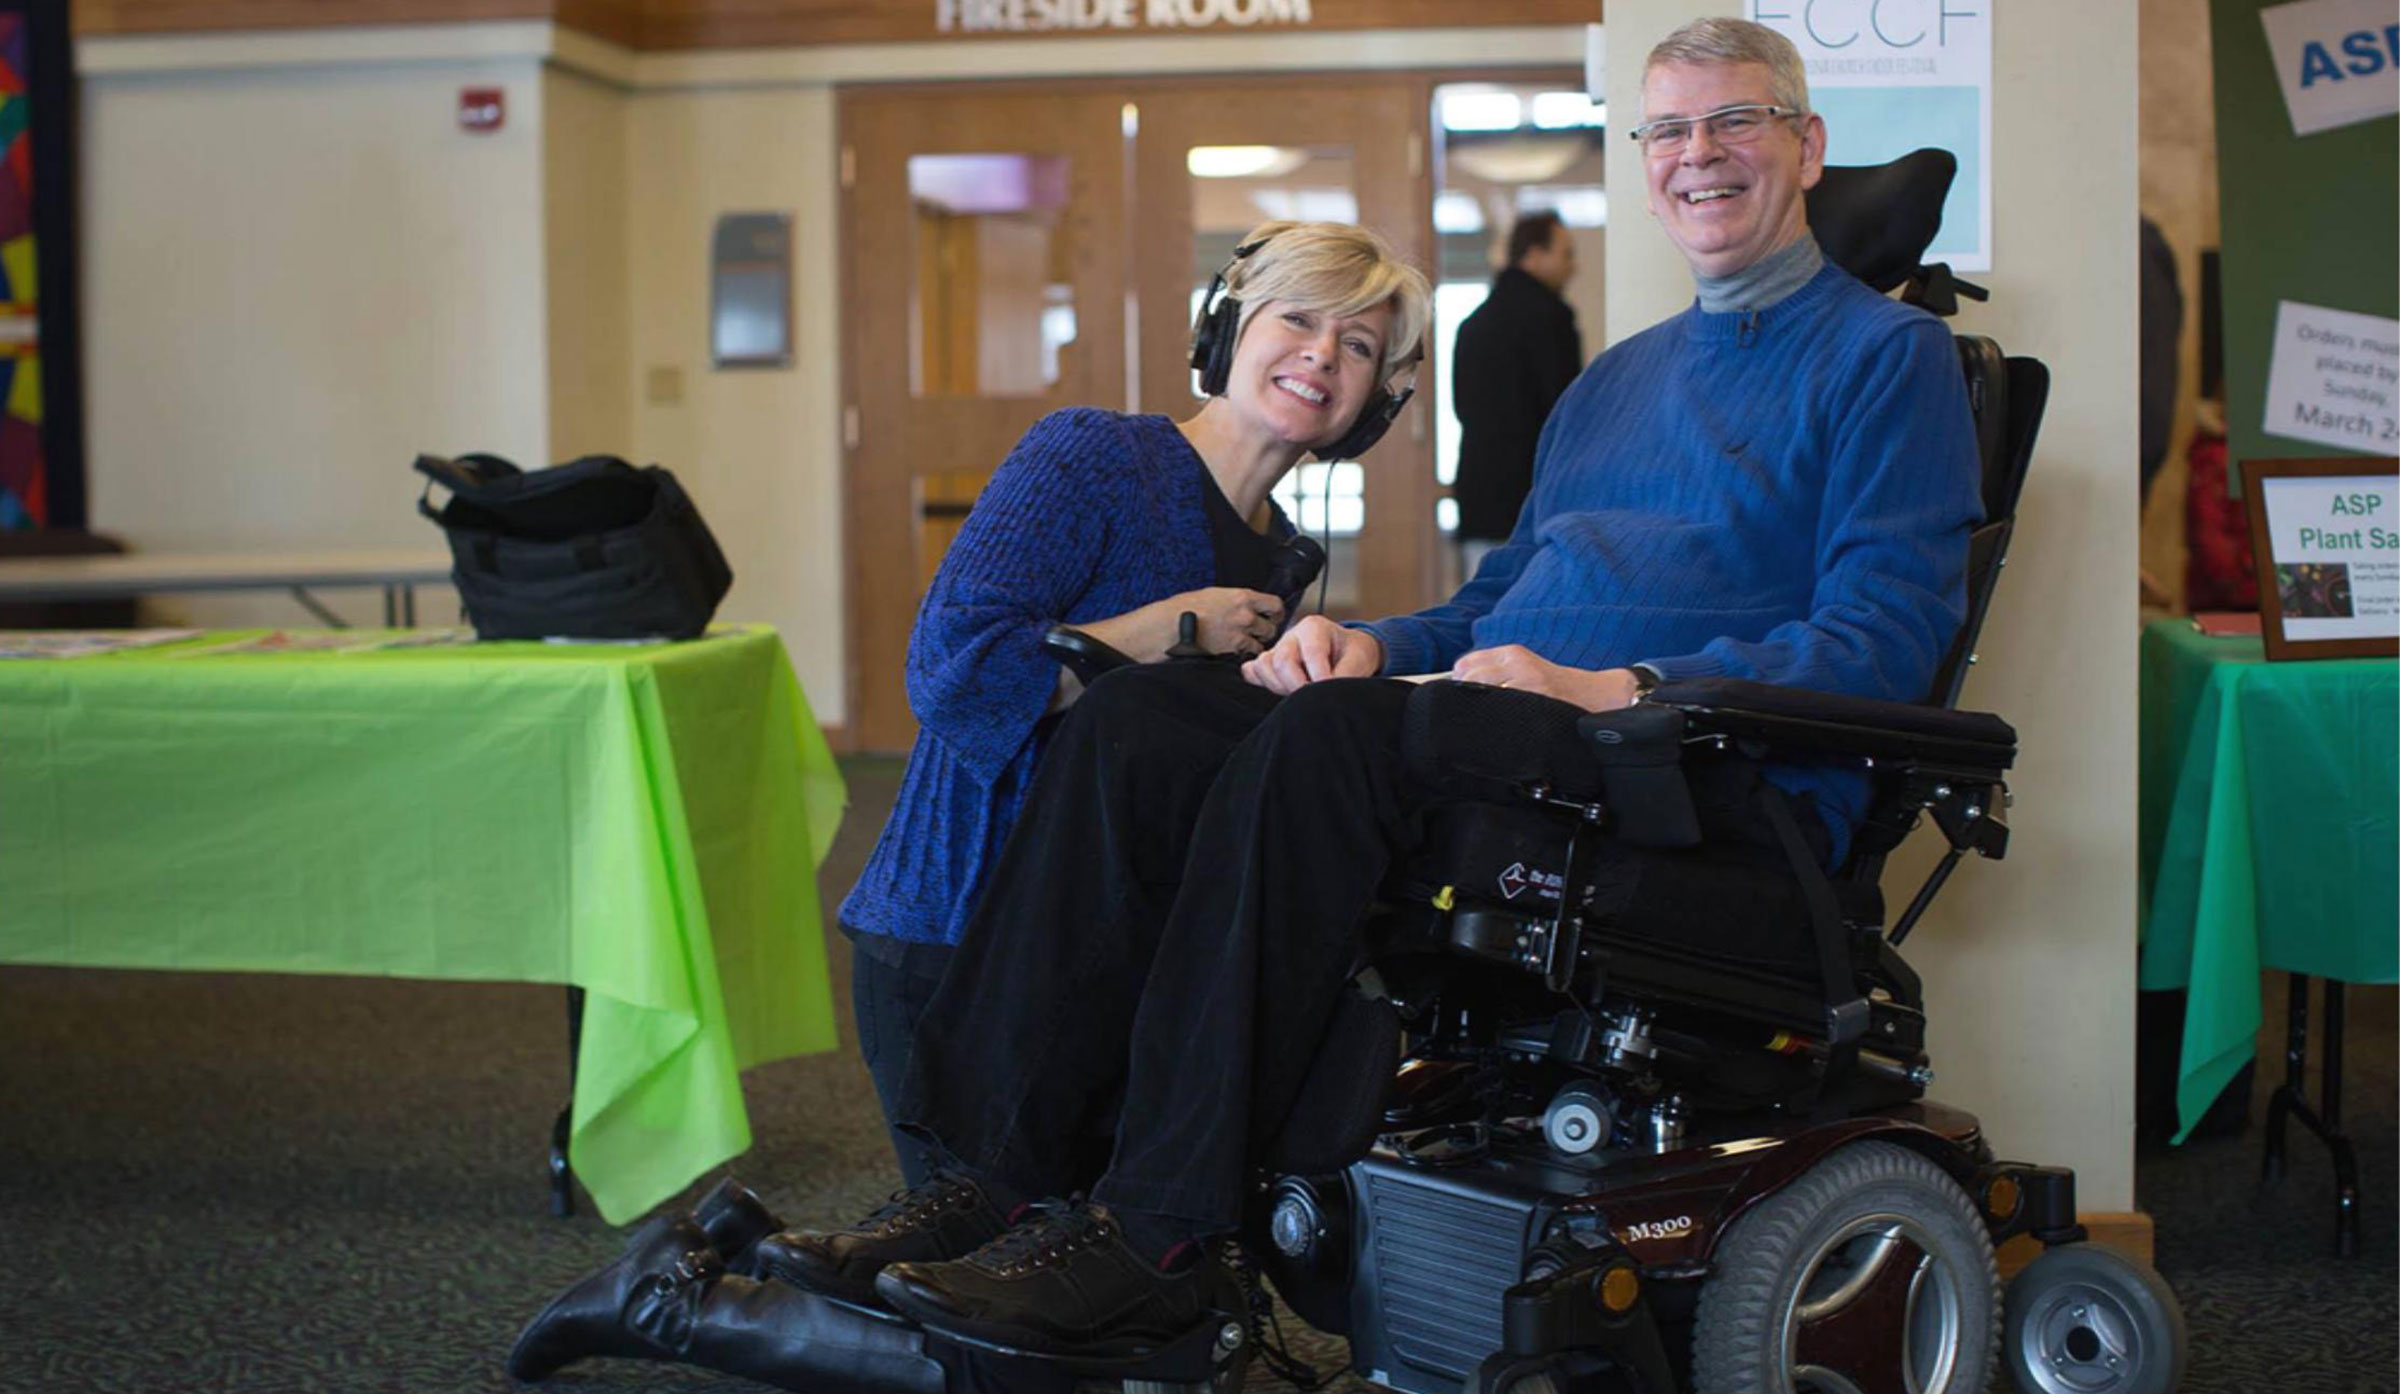 Cathy Wurzer and Bruce Kramer